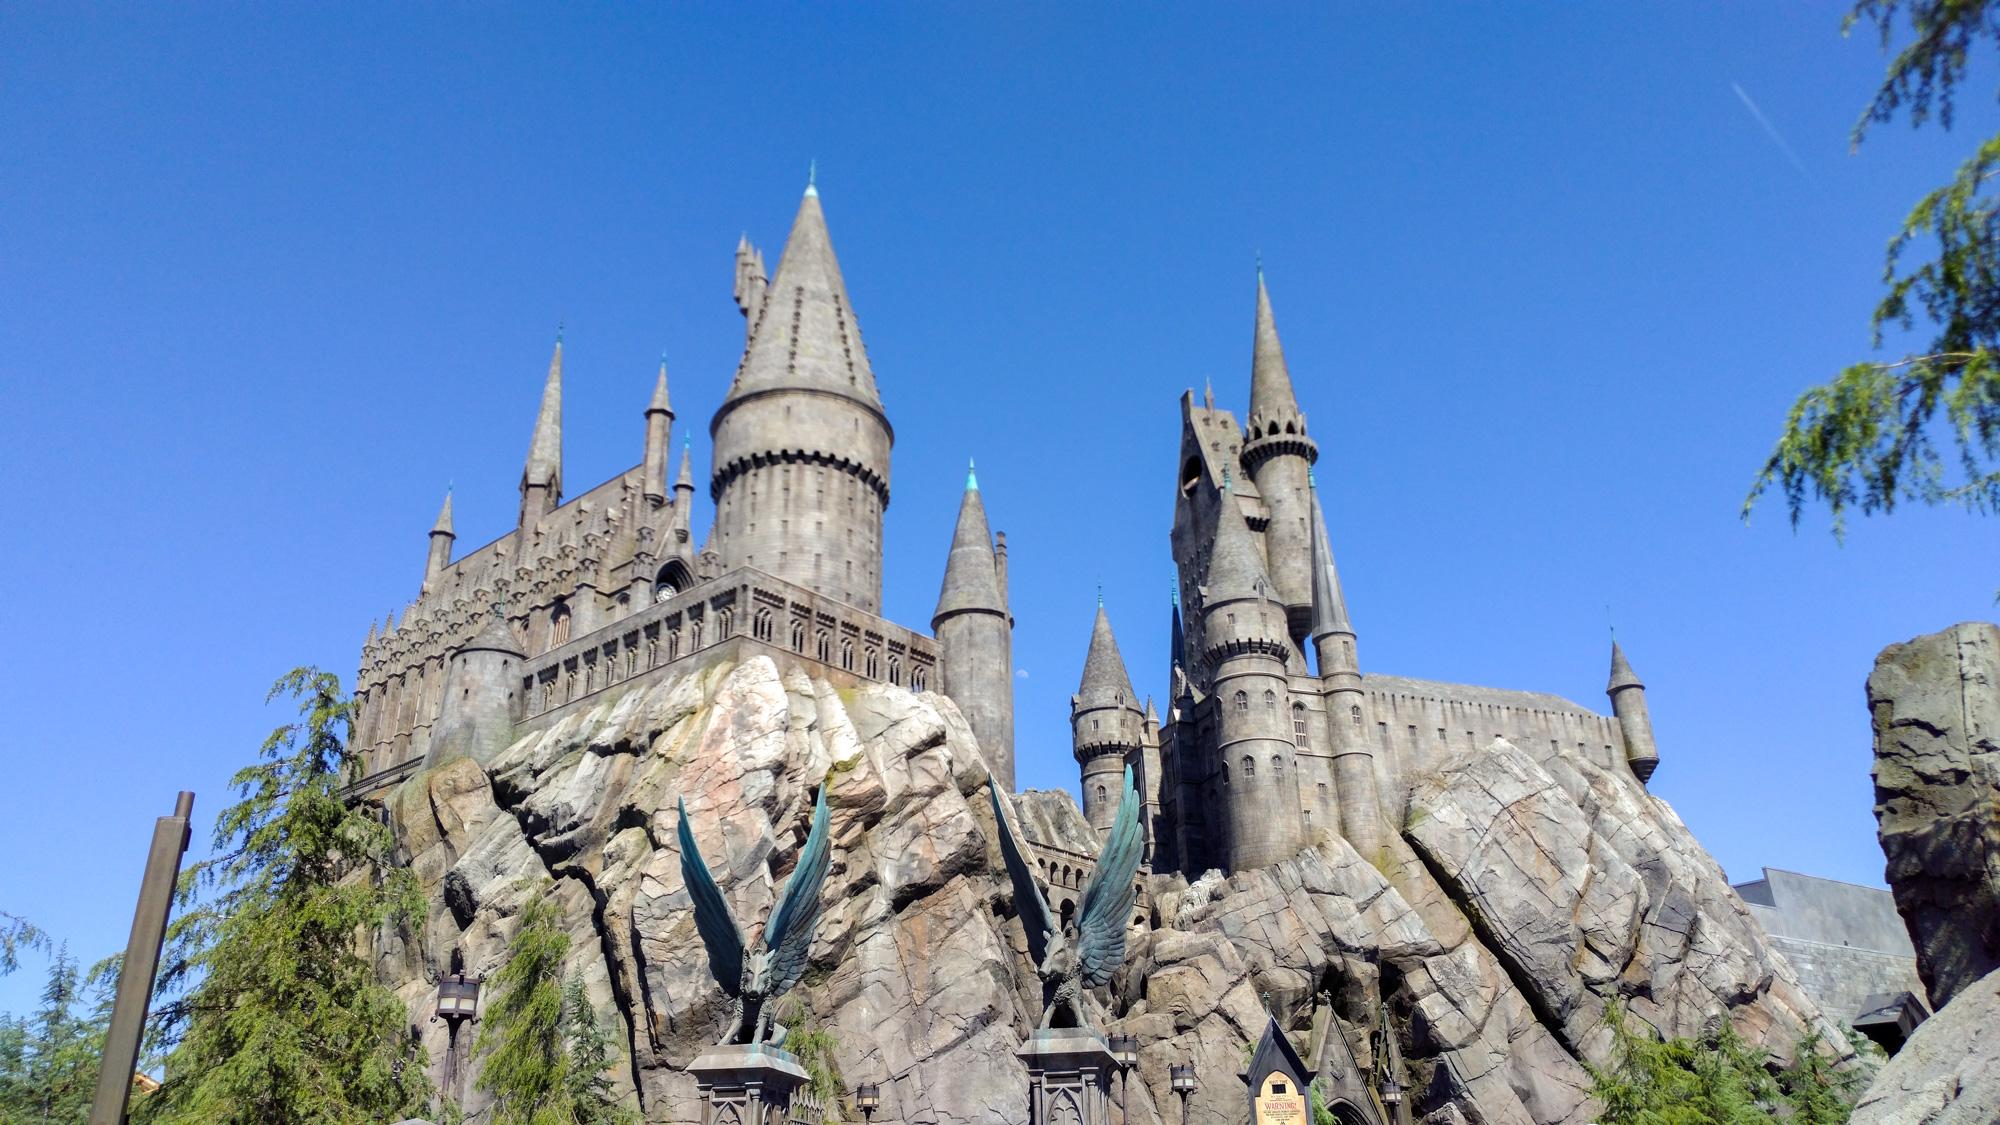 Los Angeles - Universal Studios - Hogwarts